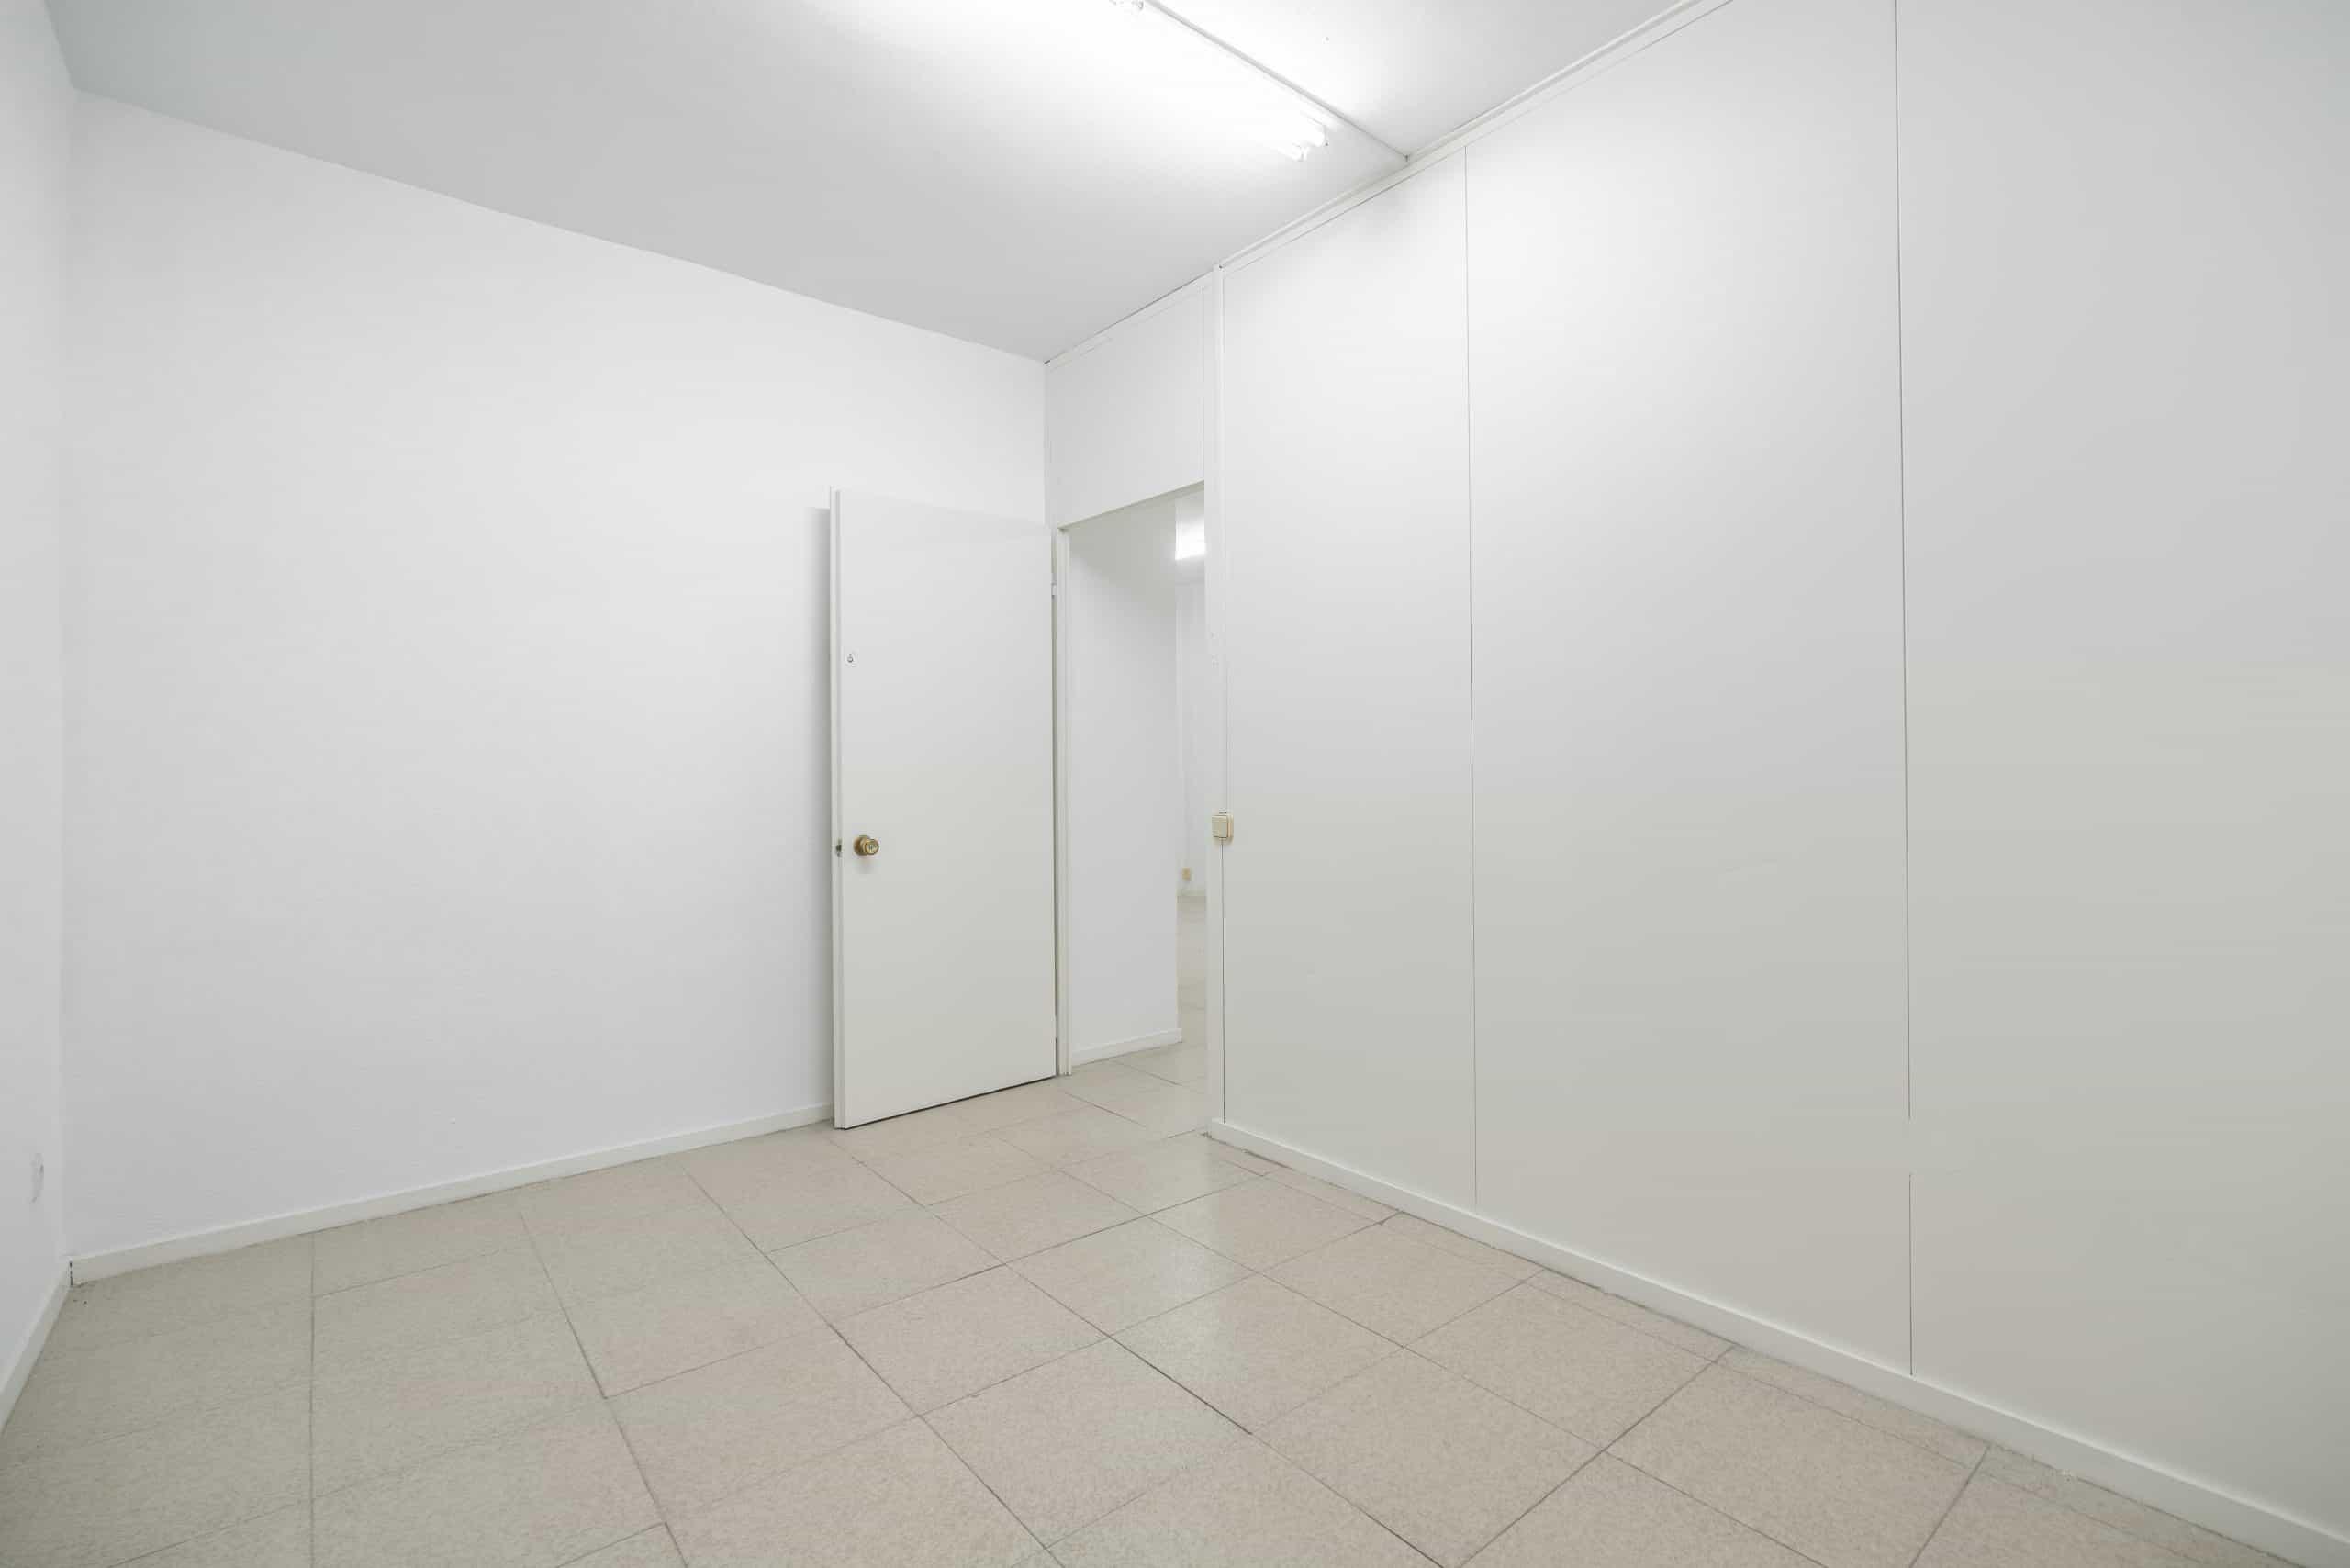 Agencia Inmobiliaria de Madrid-FUTUROCASA-Zona ARGANZUELA-LEGAZPI -calle Modesto Lafuente 41,1ºC estancia 7